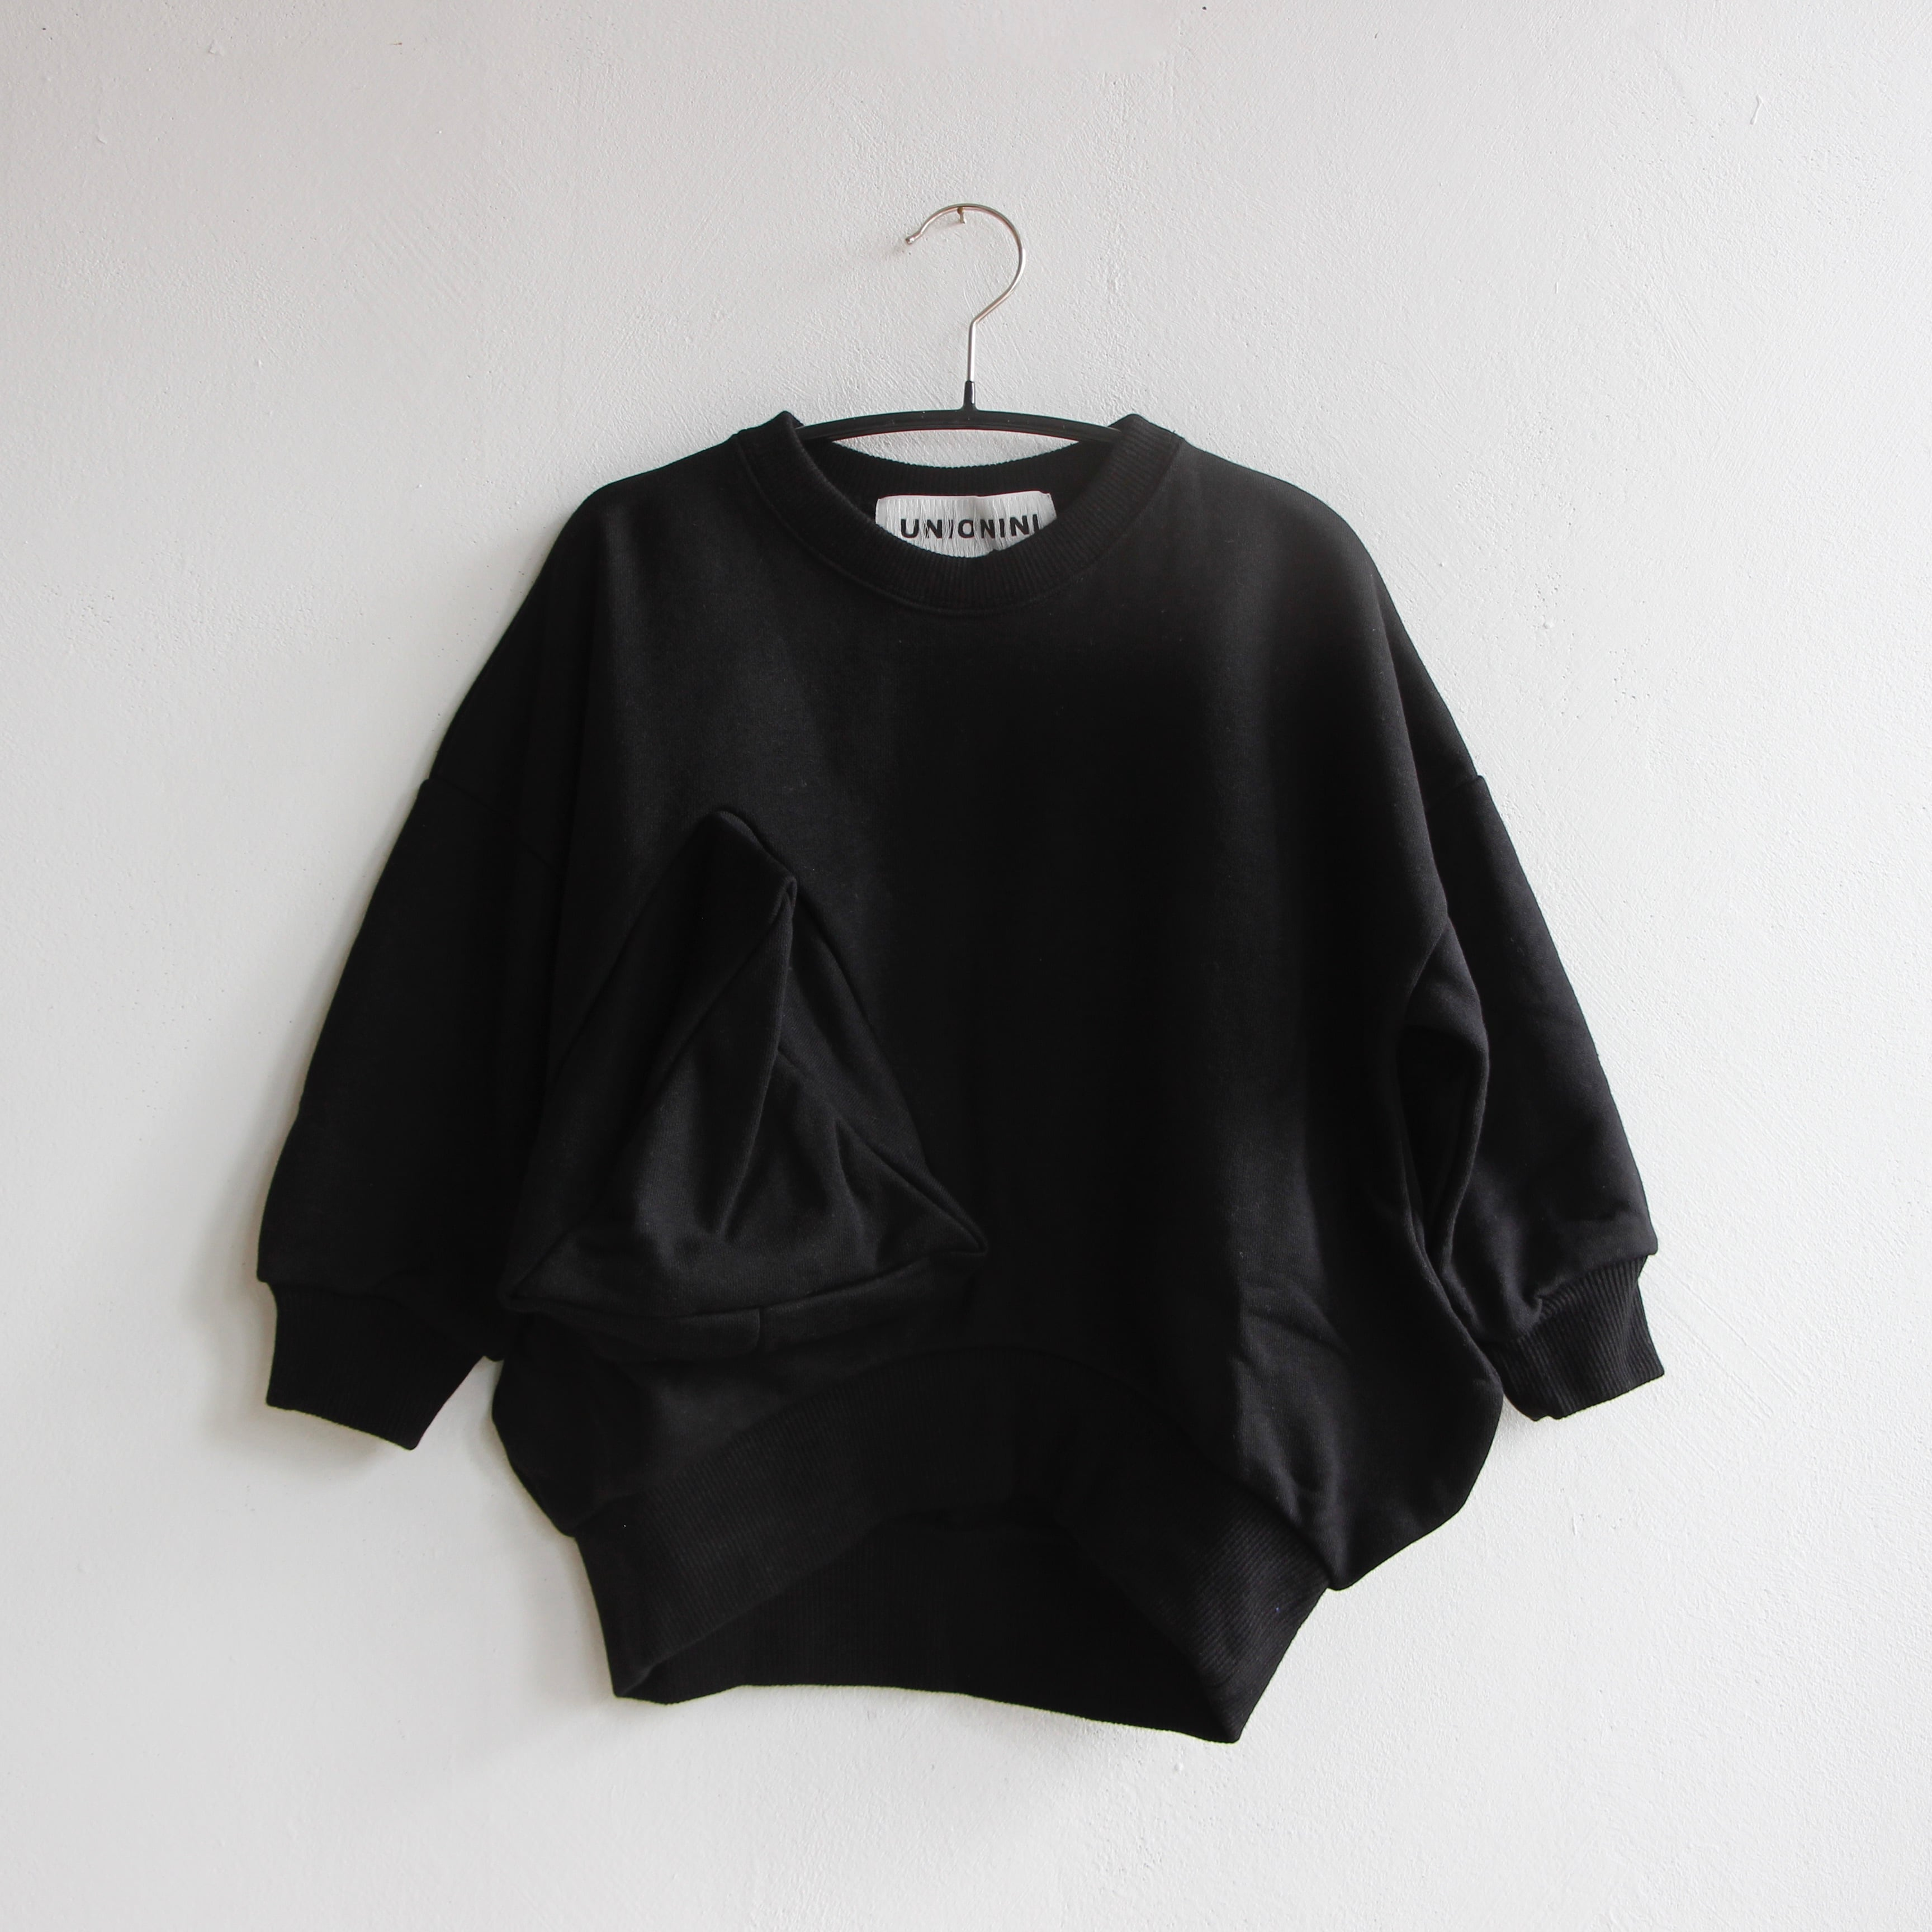 《UNIONINI 2021AW》◯△ sweat shirt / black / 1-12Y